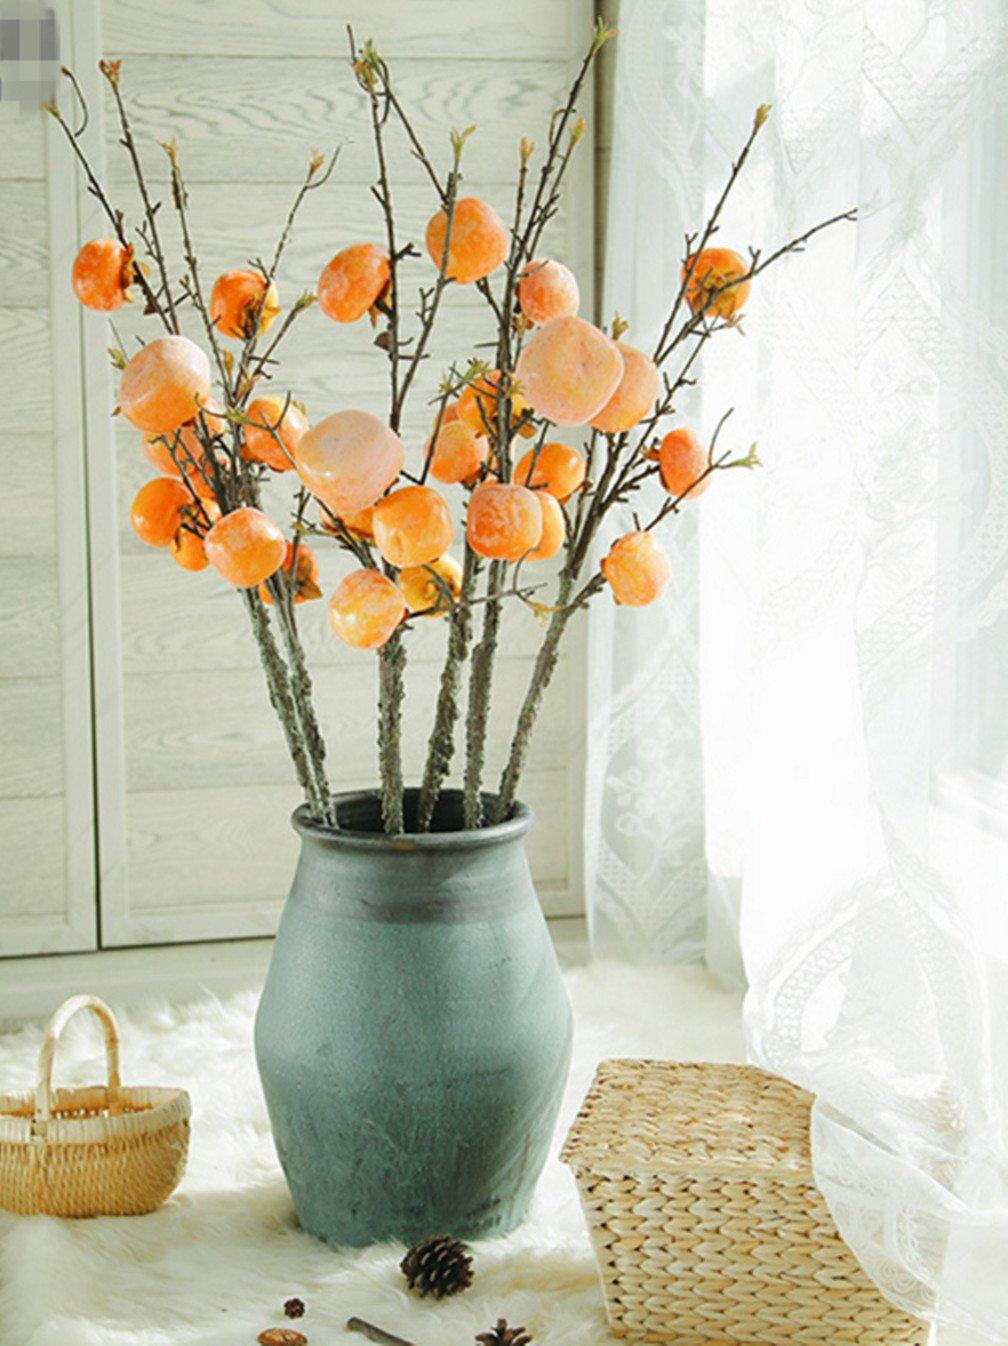 skyseen 3pcs人工花Persimmon果物Berries Bouquet Floral Gardenホーム装飾、B B07B6QNP39